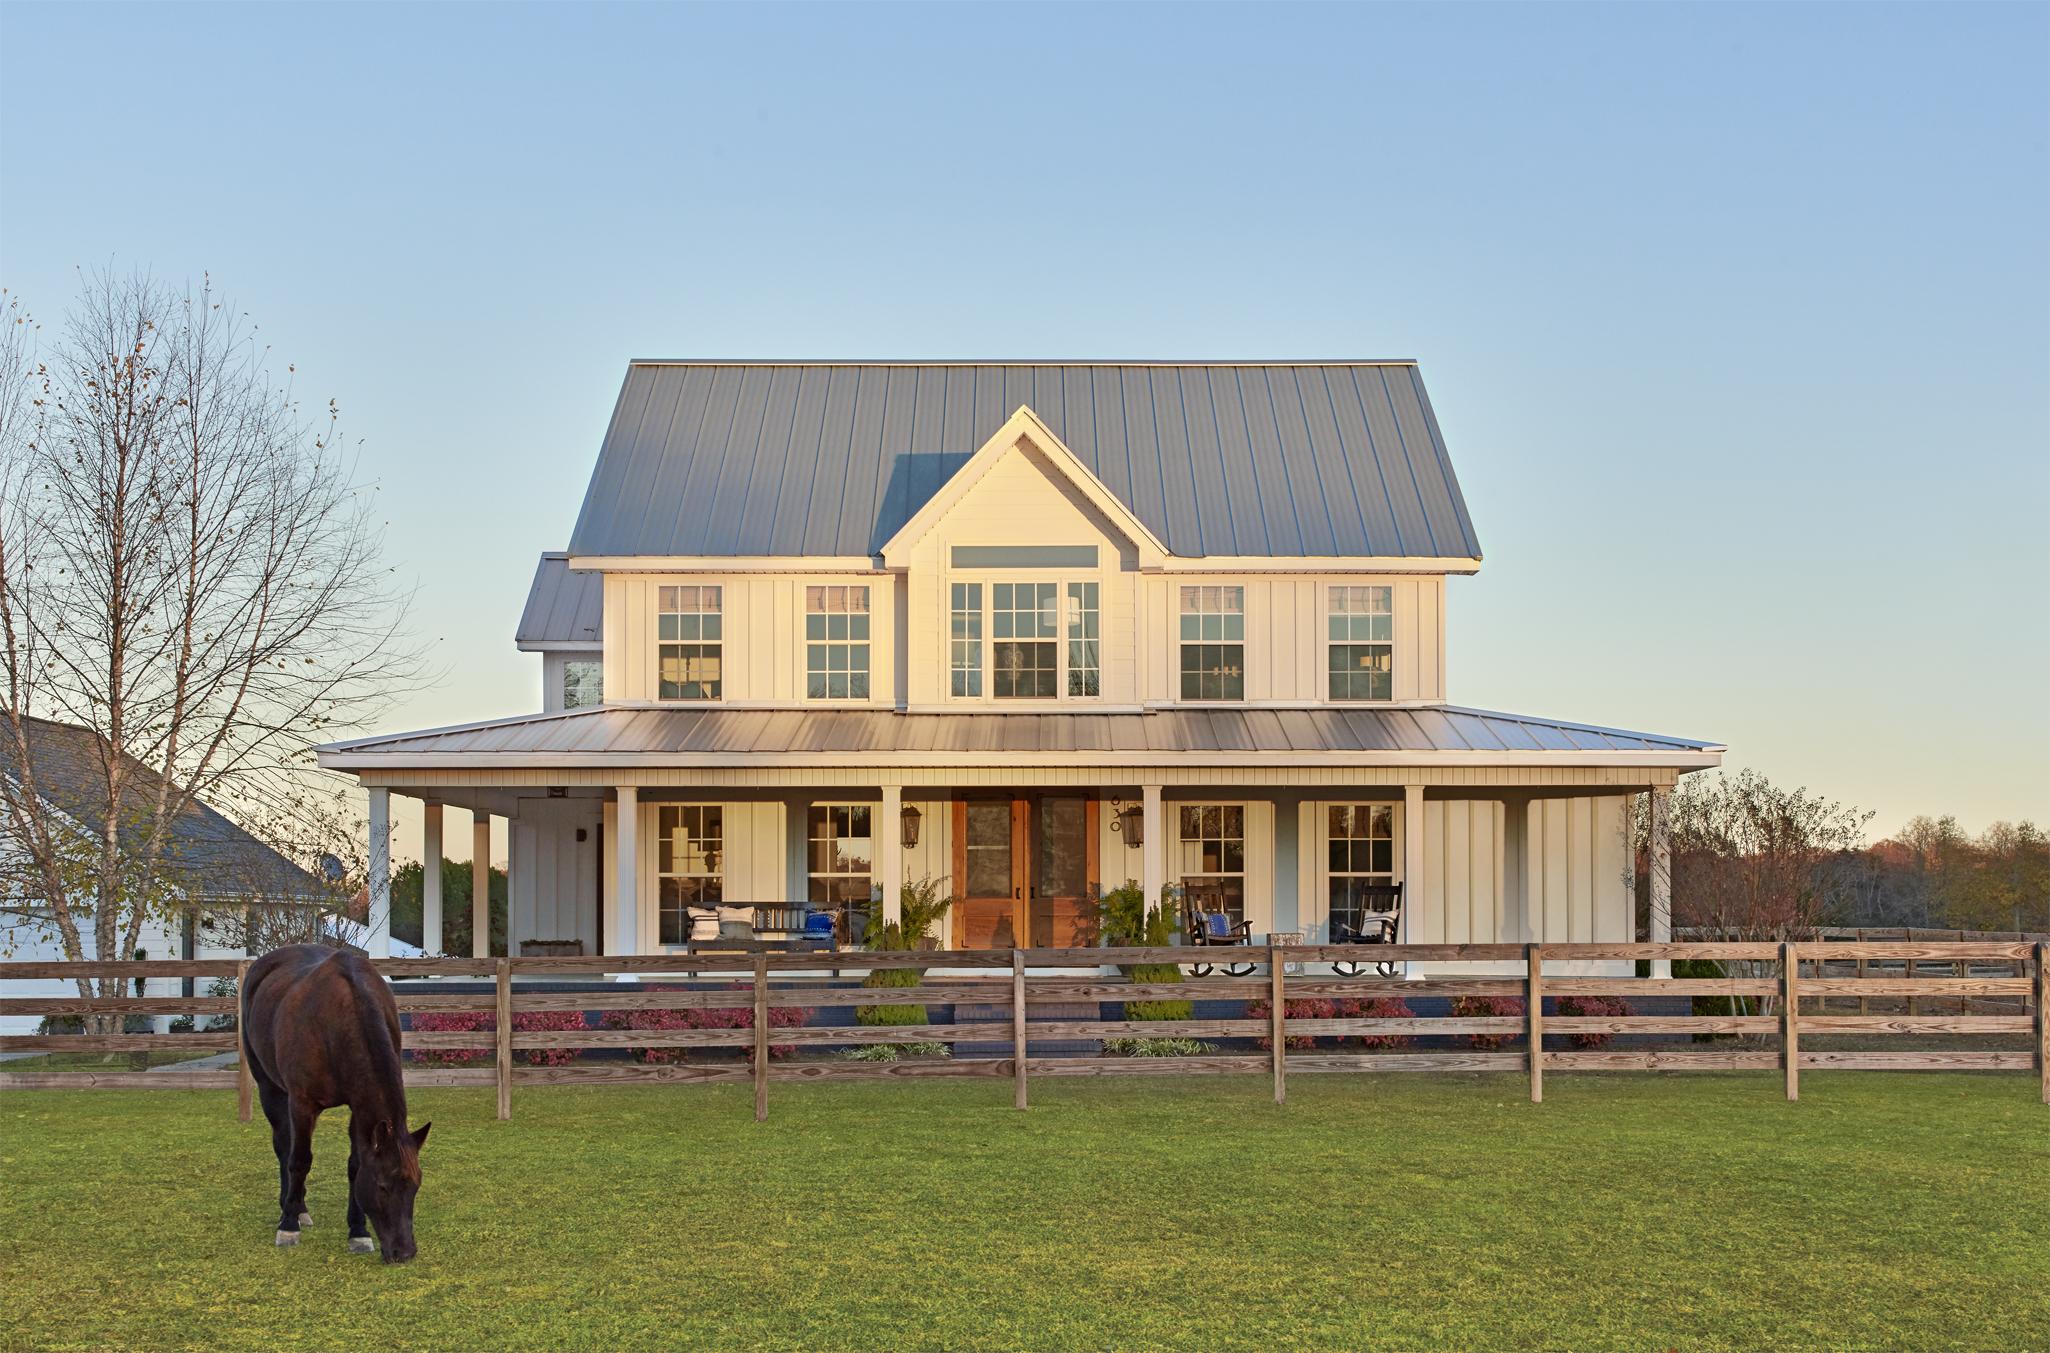 Alabama Farmhouse Before And After Farmhouse Makeover